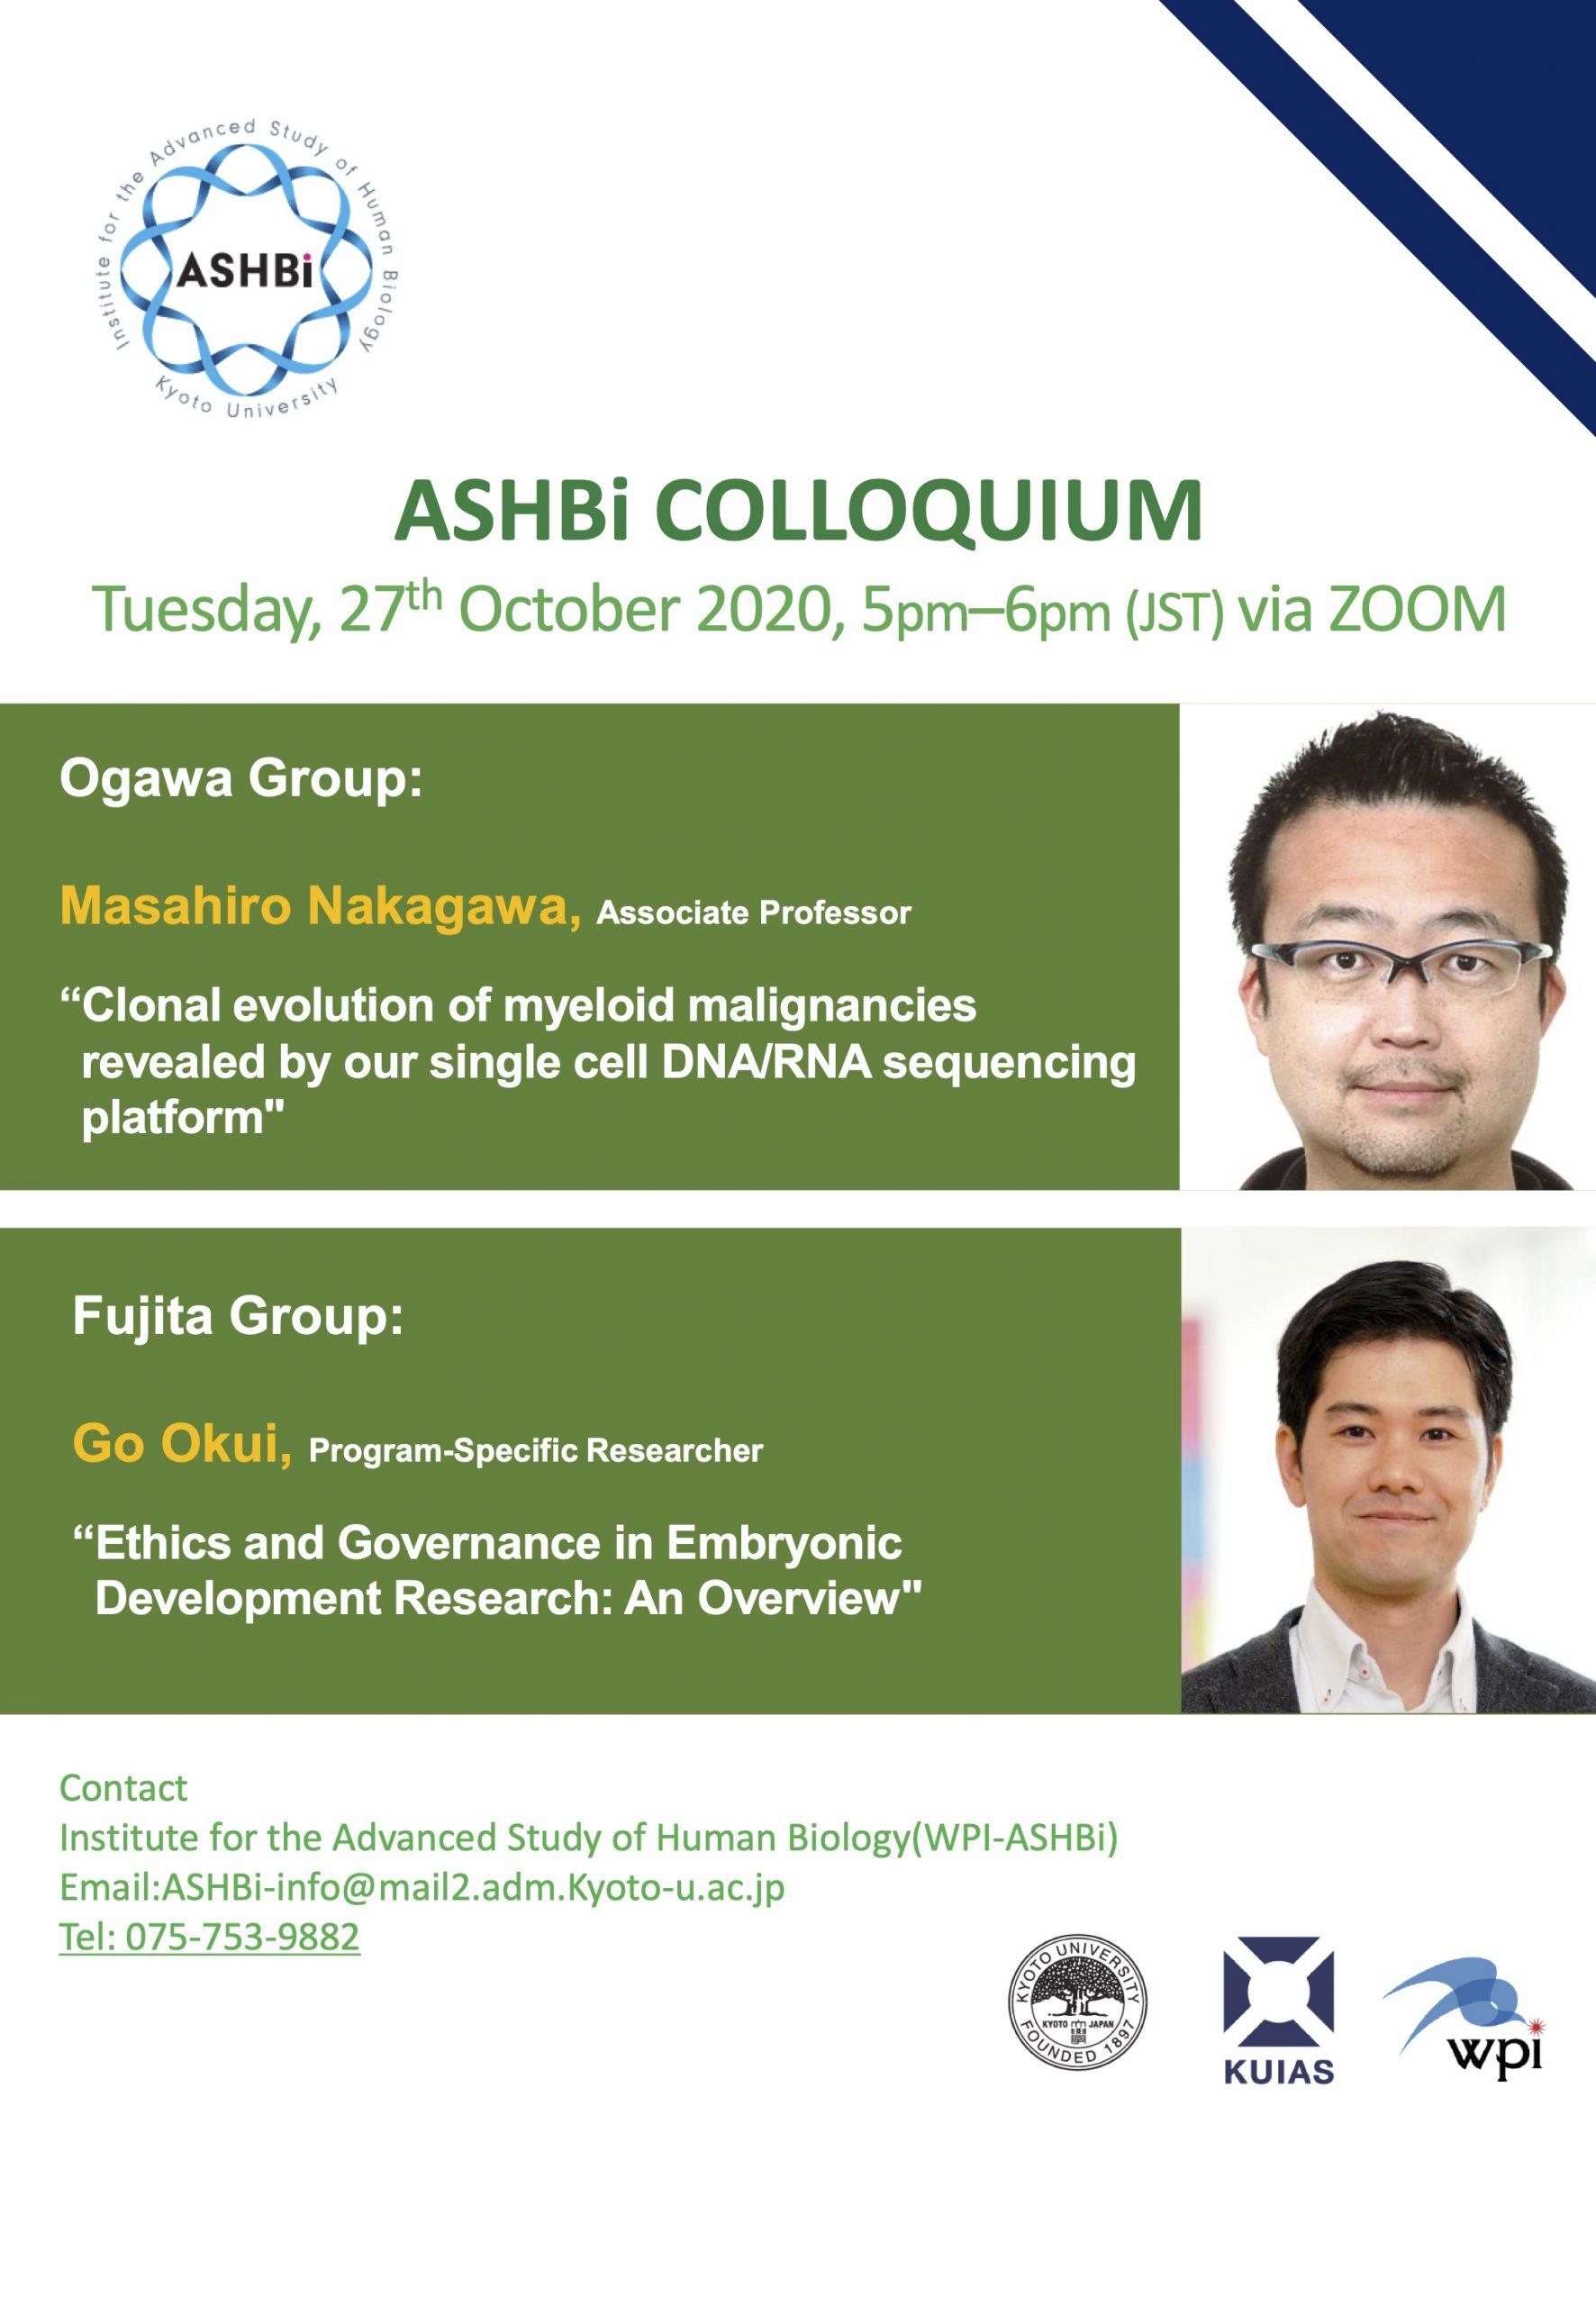 11th ASHBi Colloquium (Ogawa Group and Fujita Group)